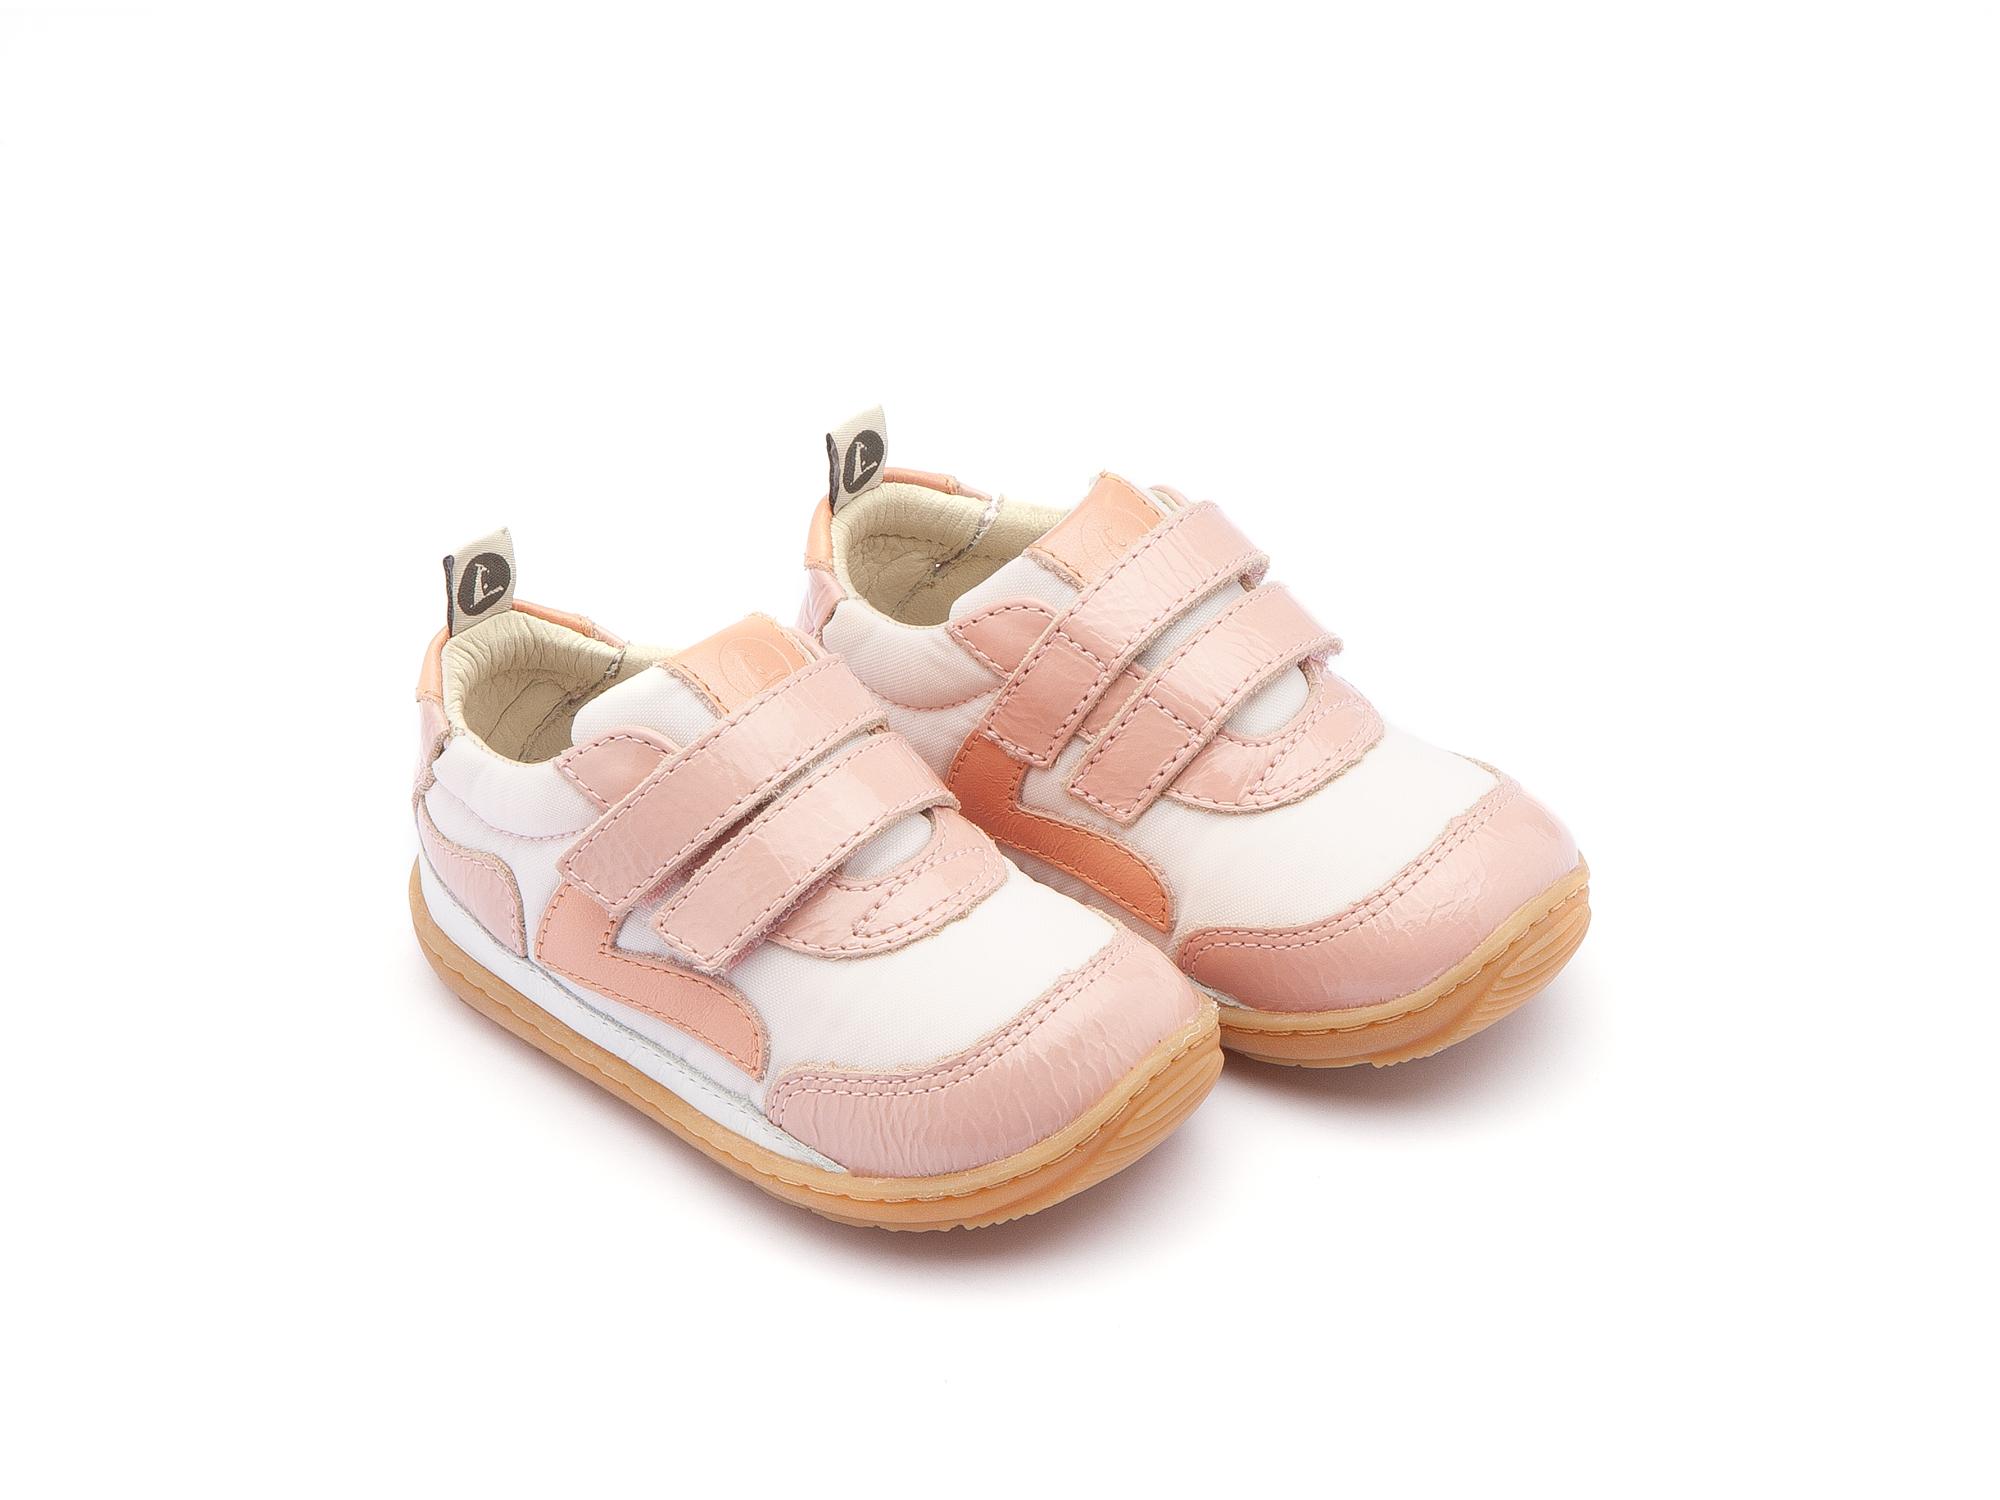 Sneaker Casual Jumpy Light Pink Nylon/ Patent Blush Baby 0 à 2 anos - 0